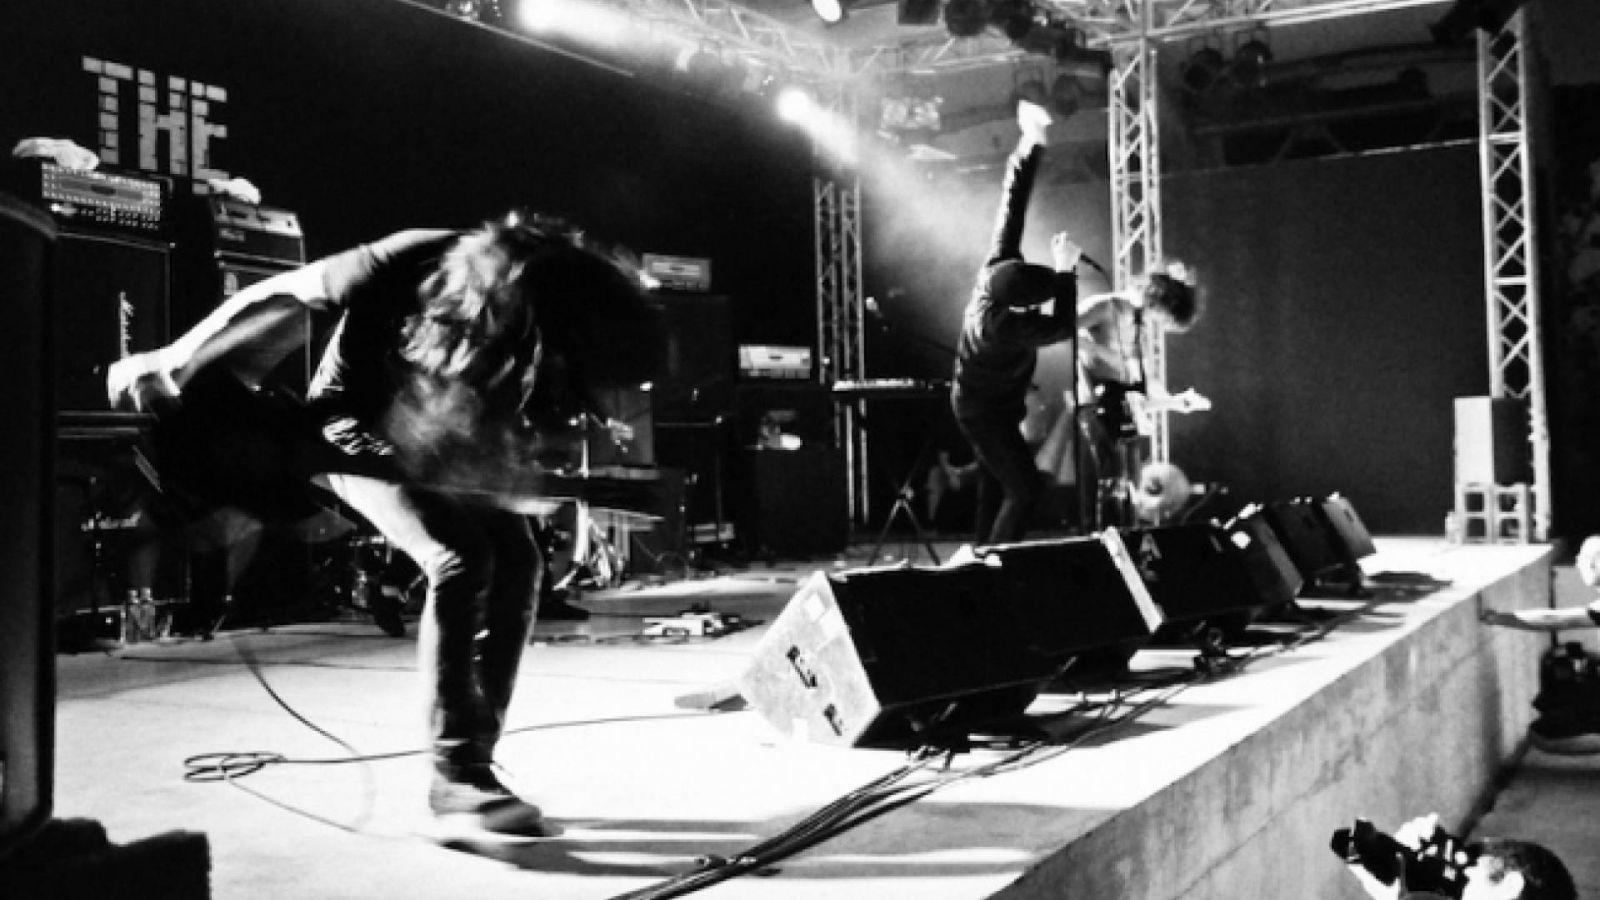 Envy rockeó Taipei © envy